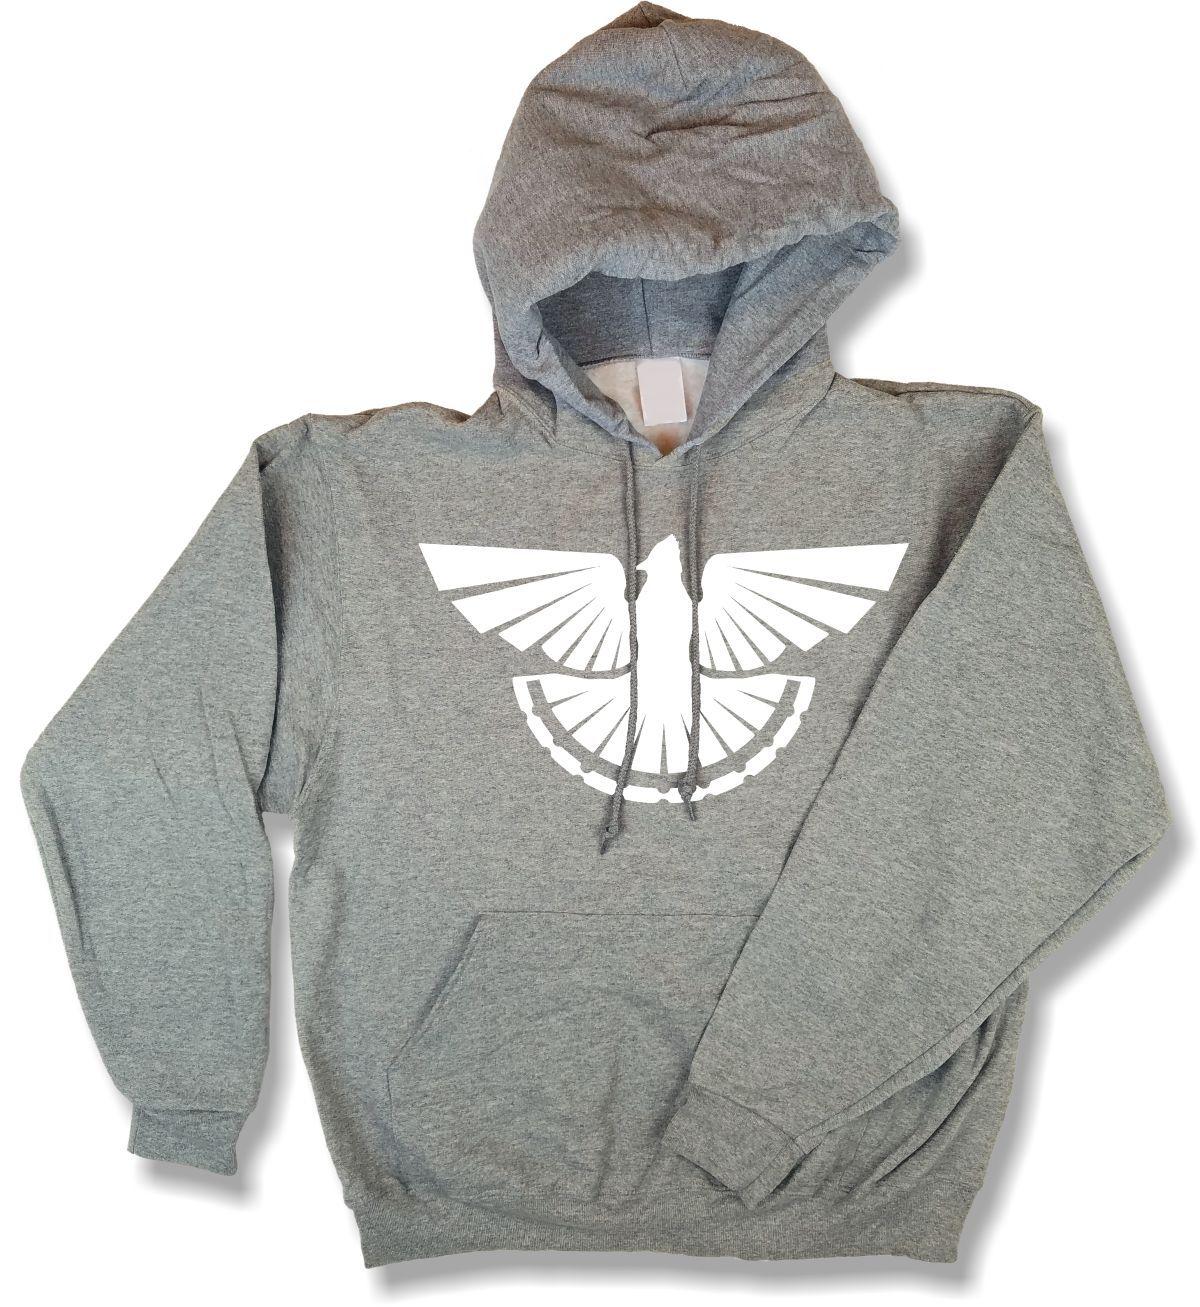 """Thunder Grouse"" Profile Upland Hunting Oxford Oxford Gray Hooded Sweatshirt"